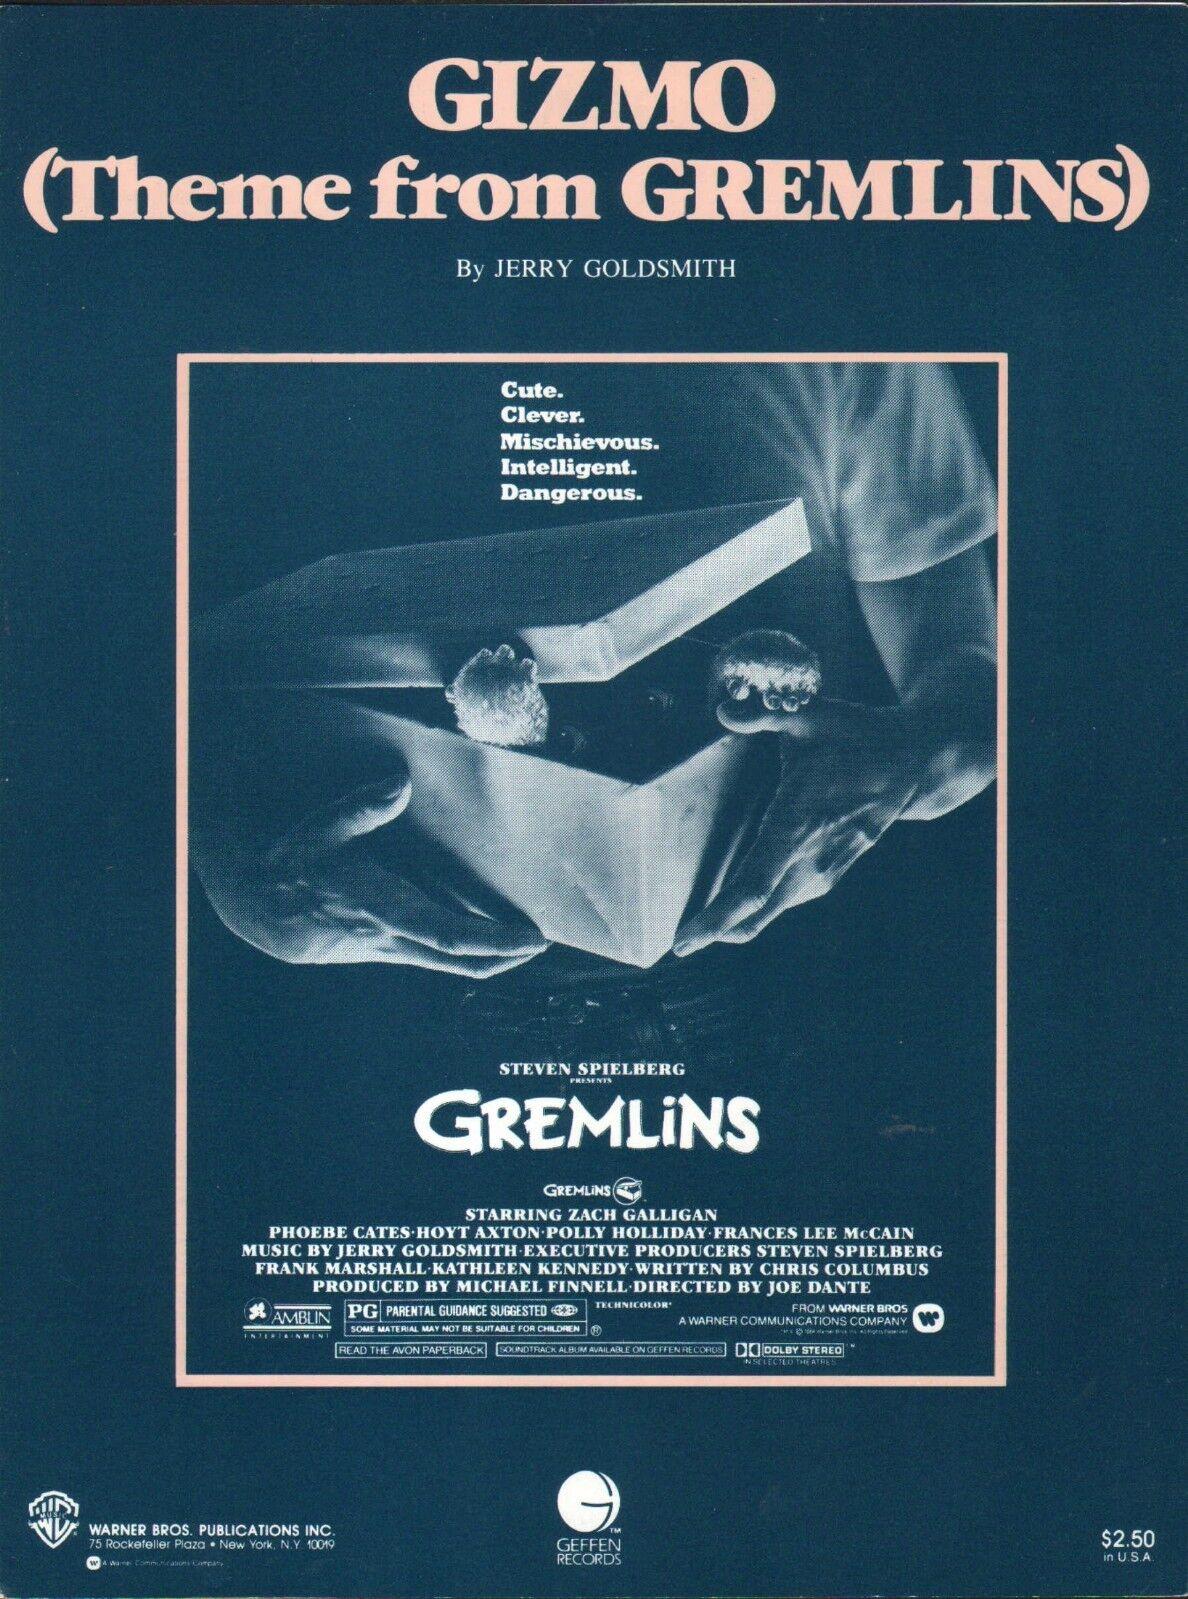 Gizmo 1985 GREMLINS Movie JERRY GOLDSMITH Sheet Music